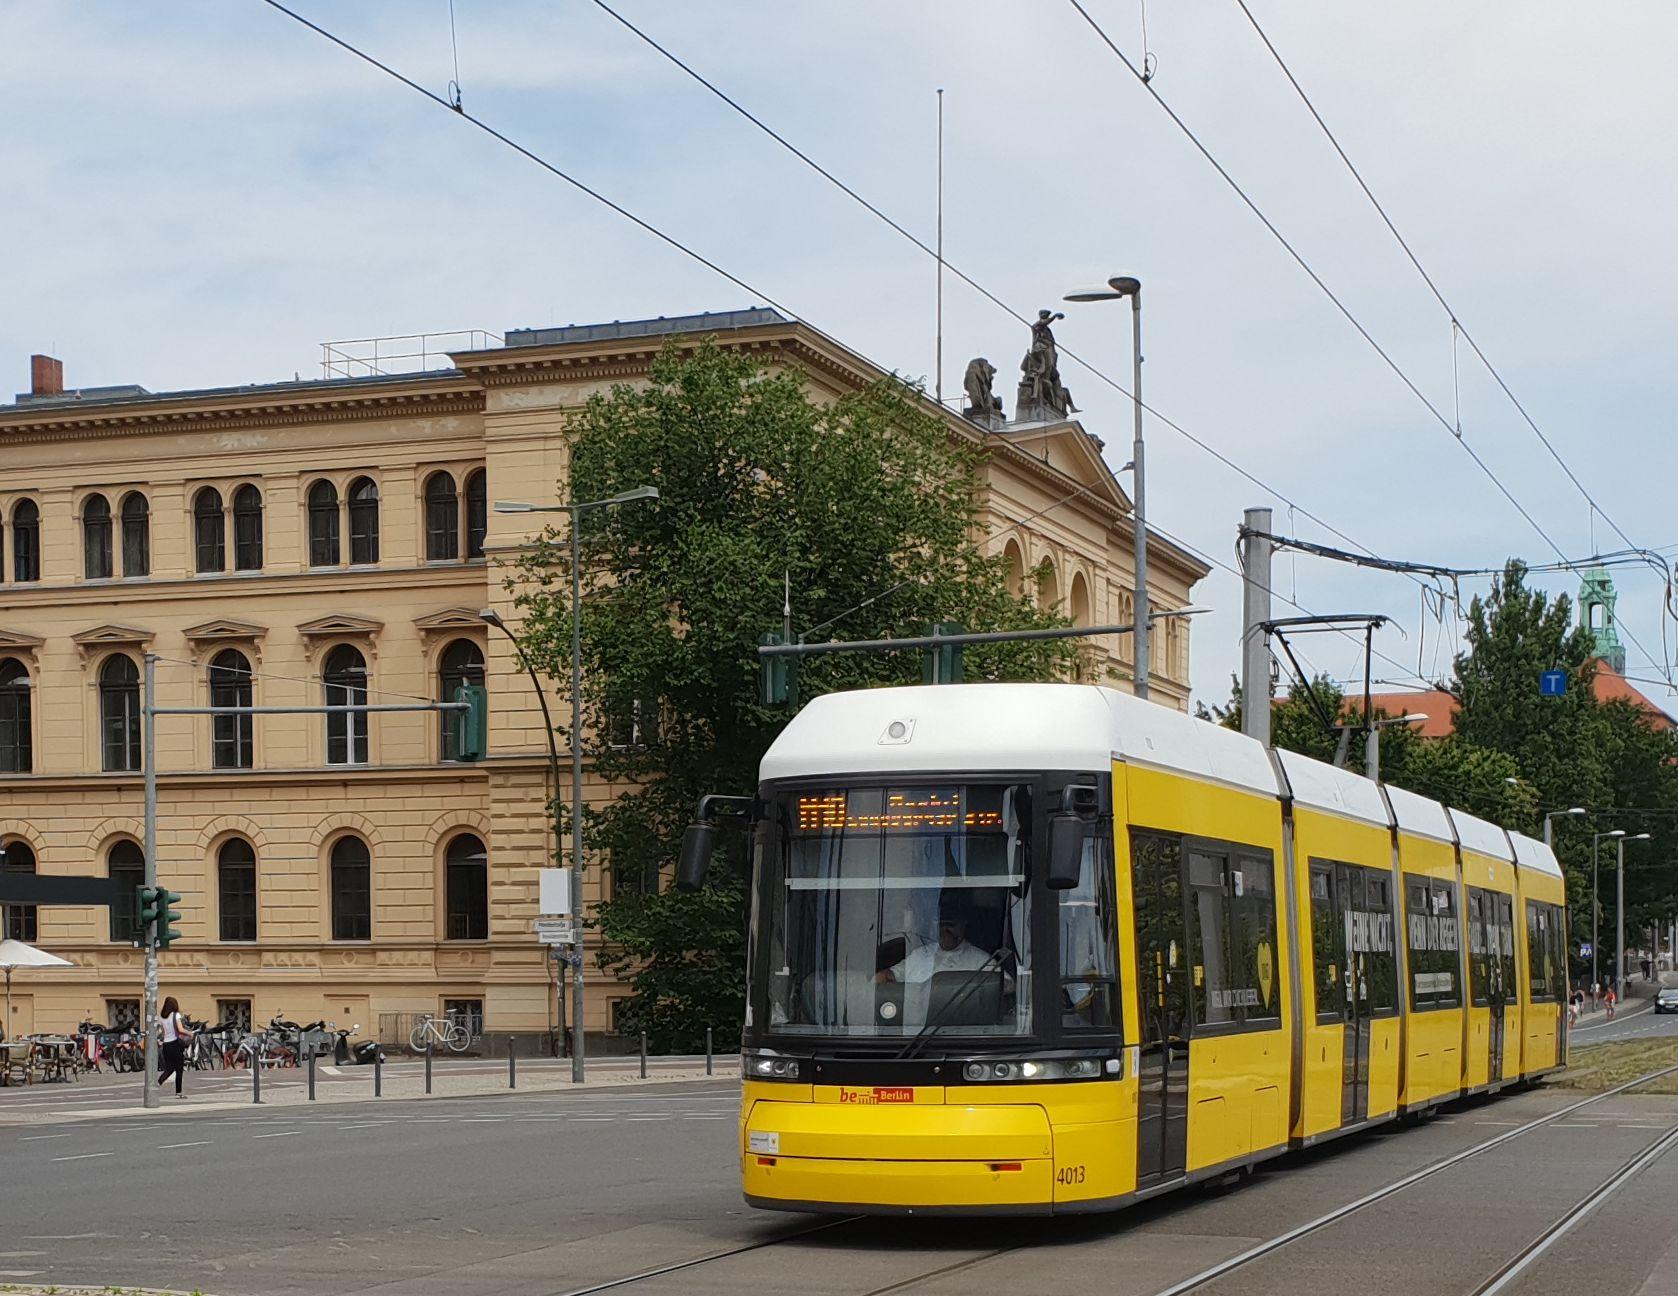 Foto: Straßenbahn 4013, Typ Flexity ZRK, Berlin Hbf, 2018